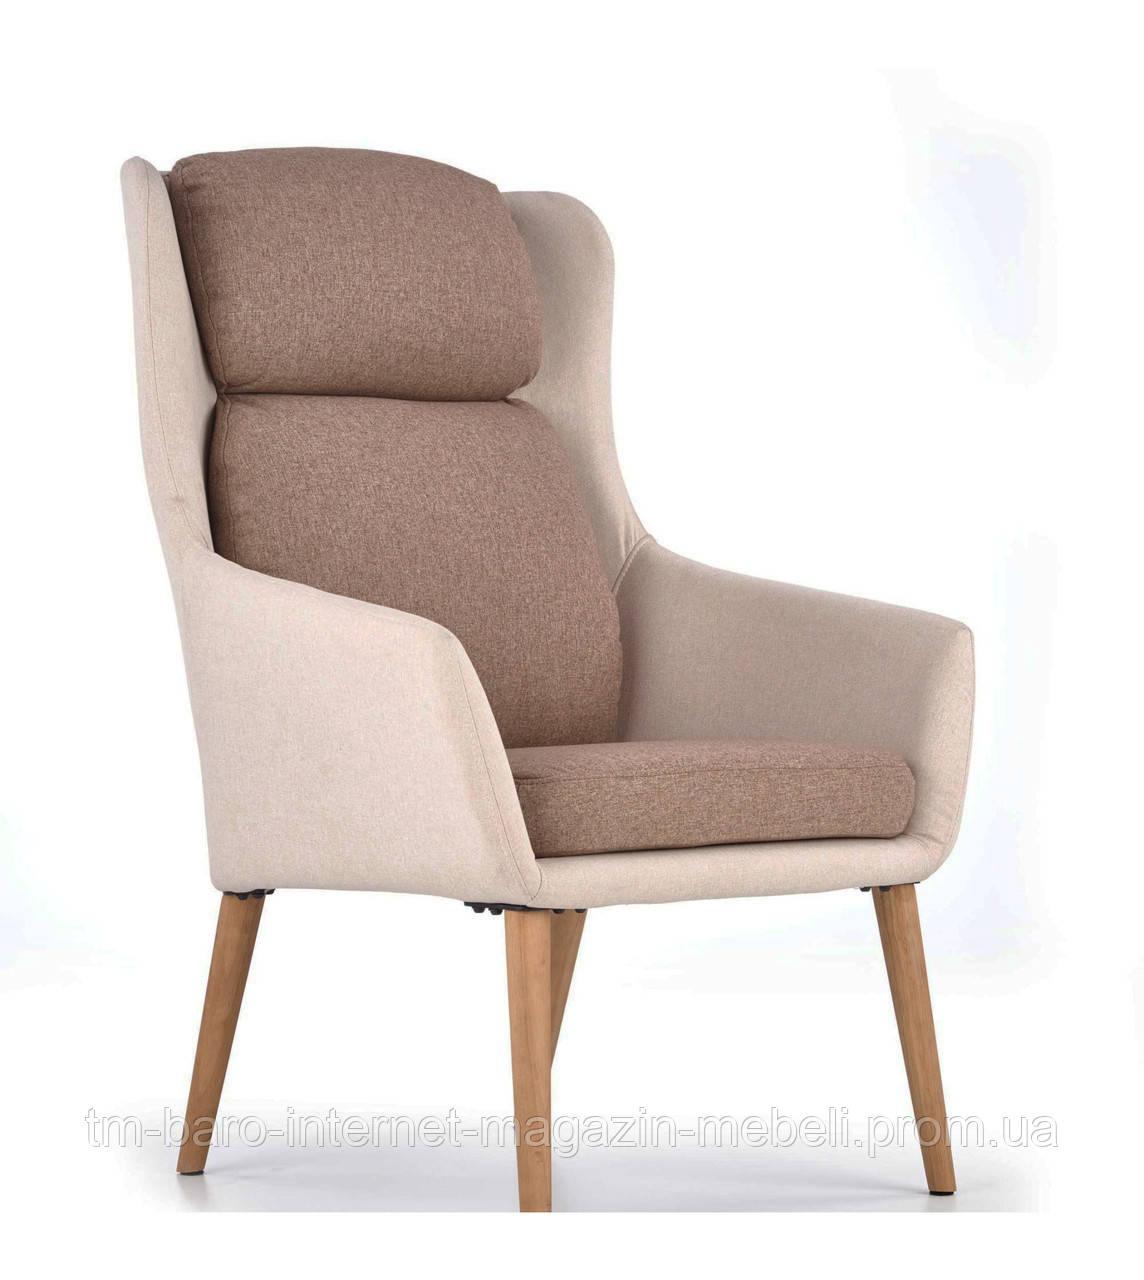 Кресло Purio (Пурио) бежево-коричневый, ткань, Halmar